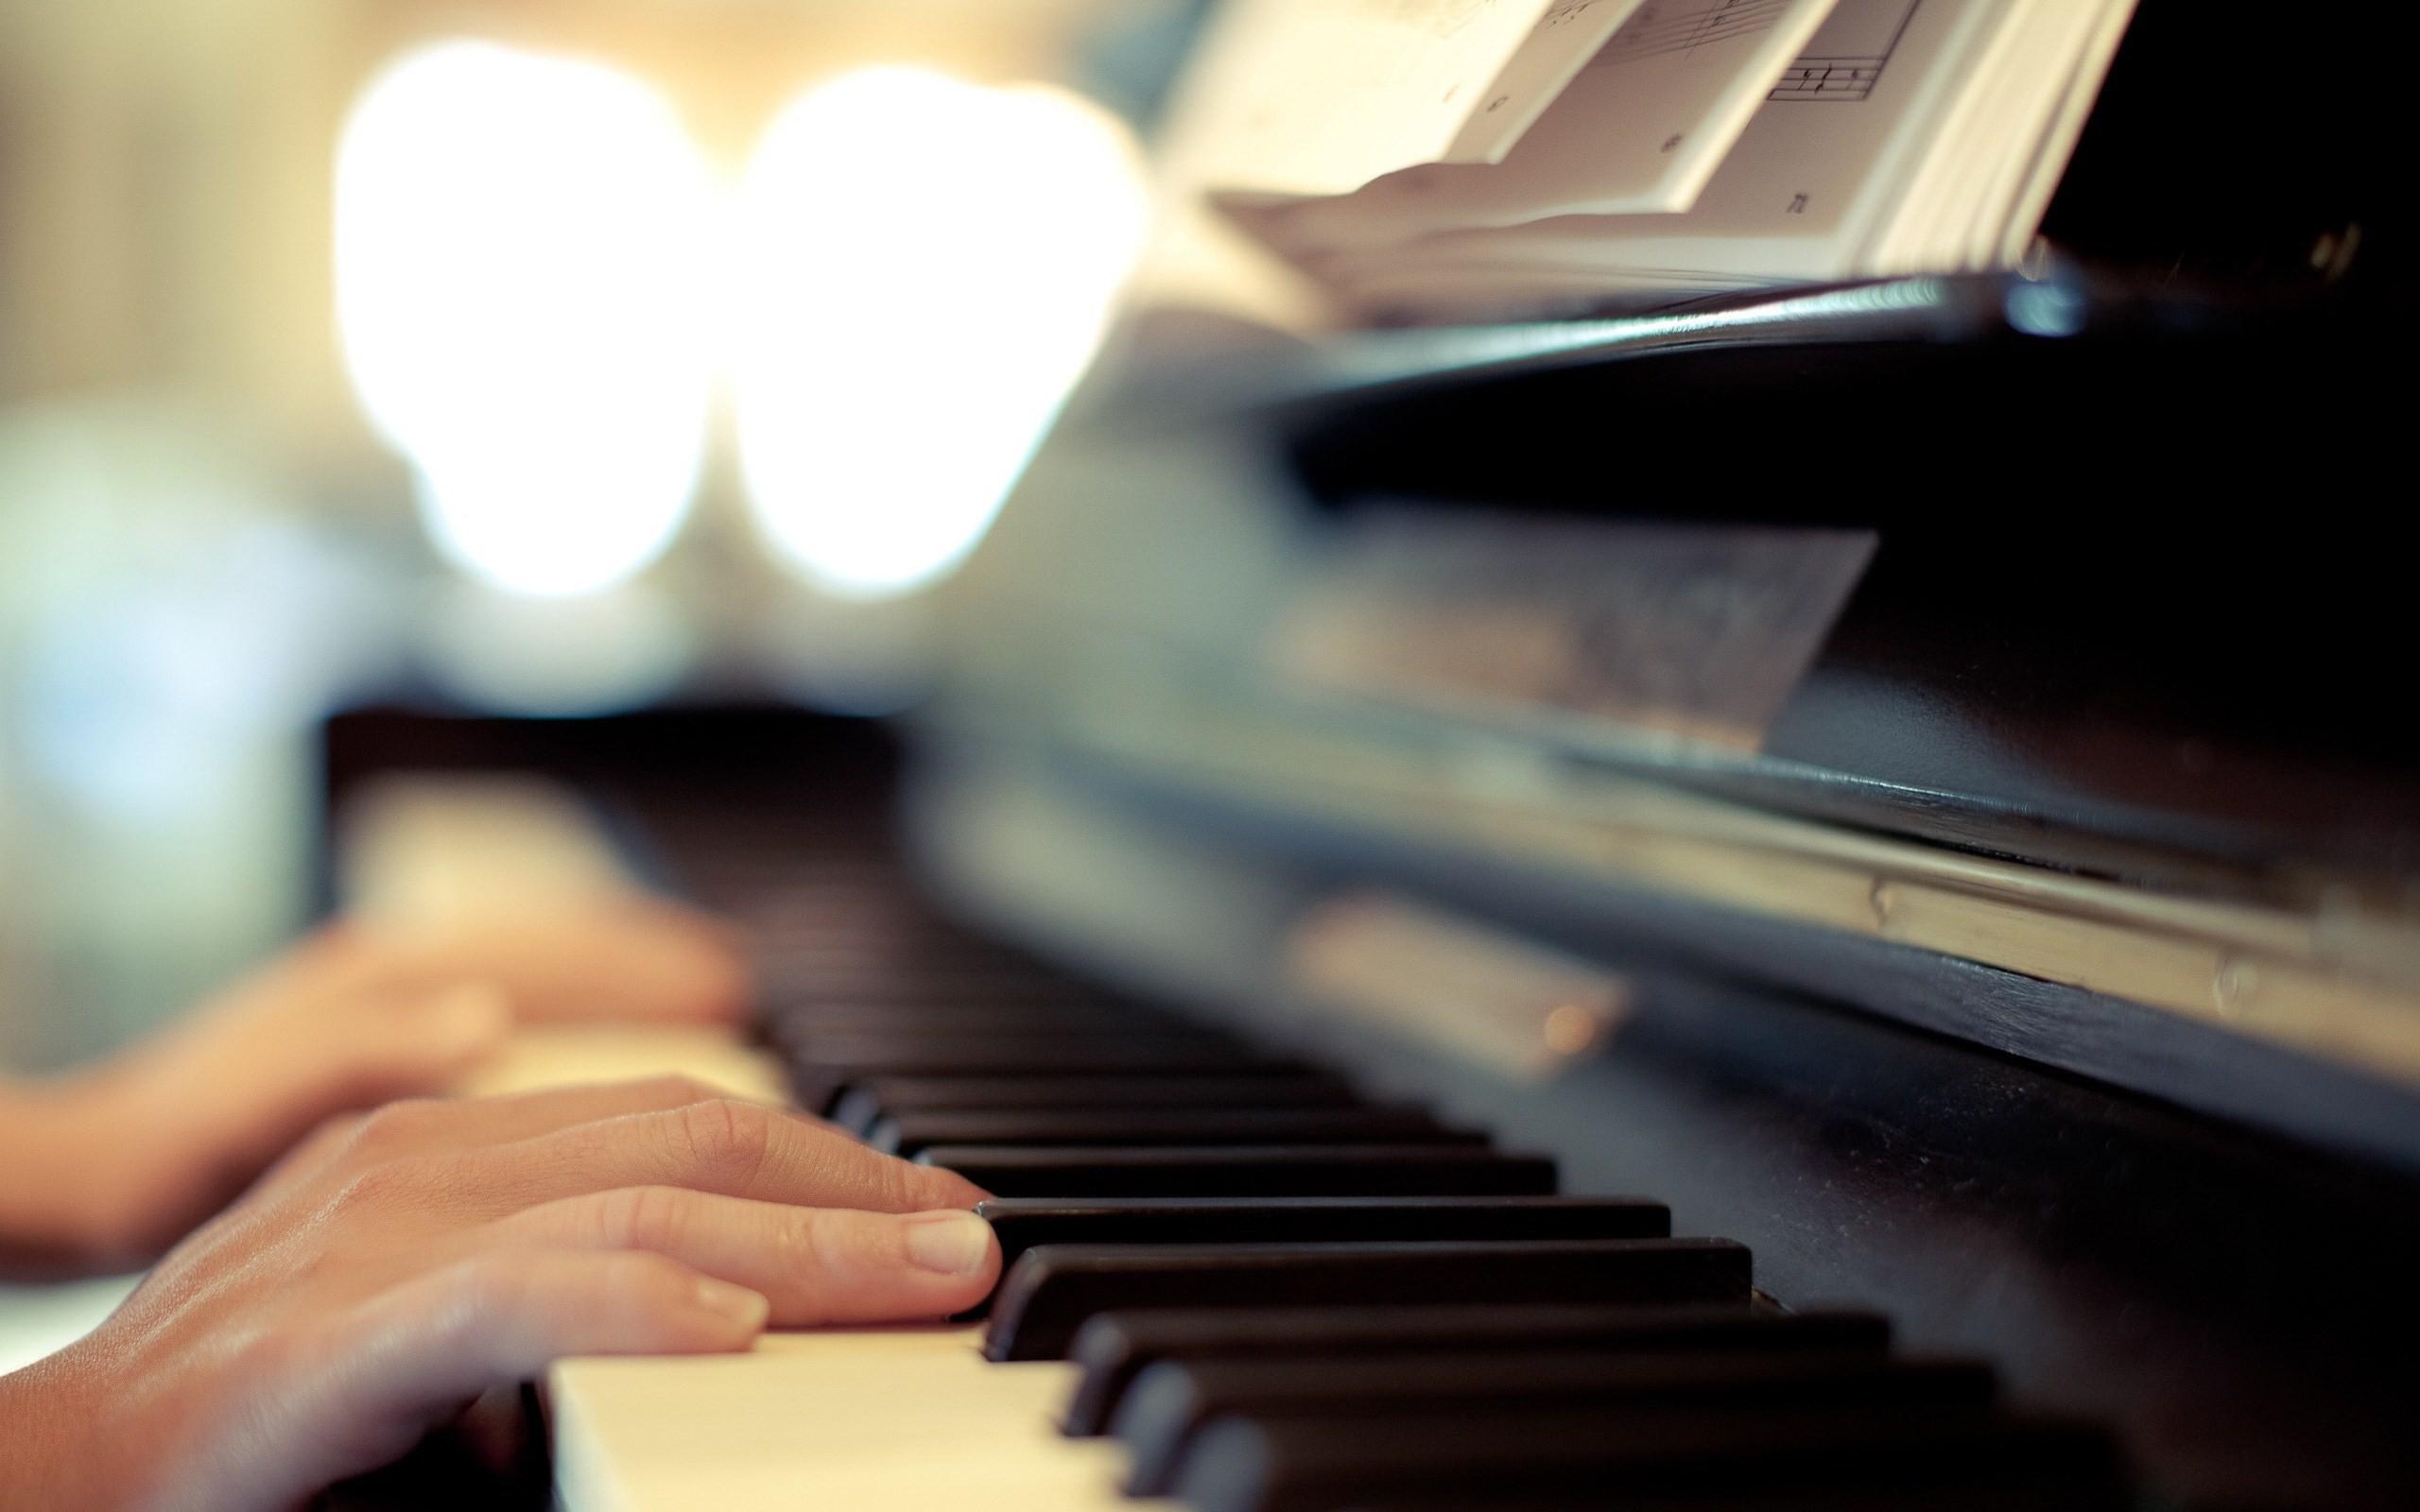 Playing Piano Wallpaper HD 1322